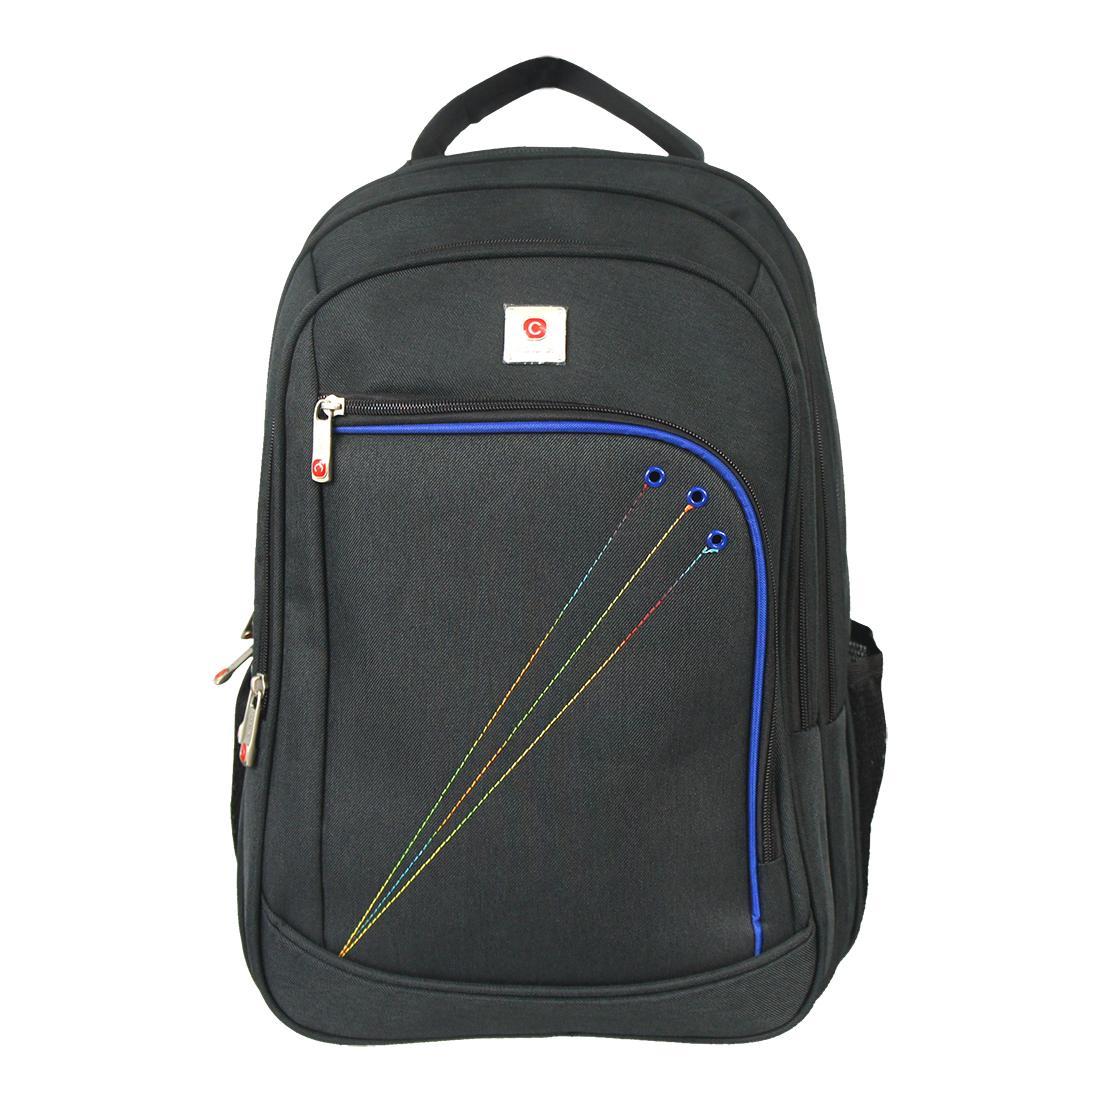 Polo Classic 9032-26 Backpack + Rain Cover - Tas Ransel Pria - Tas Sekolah 011d43de54